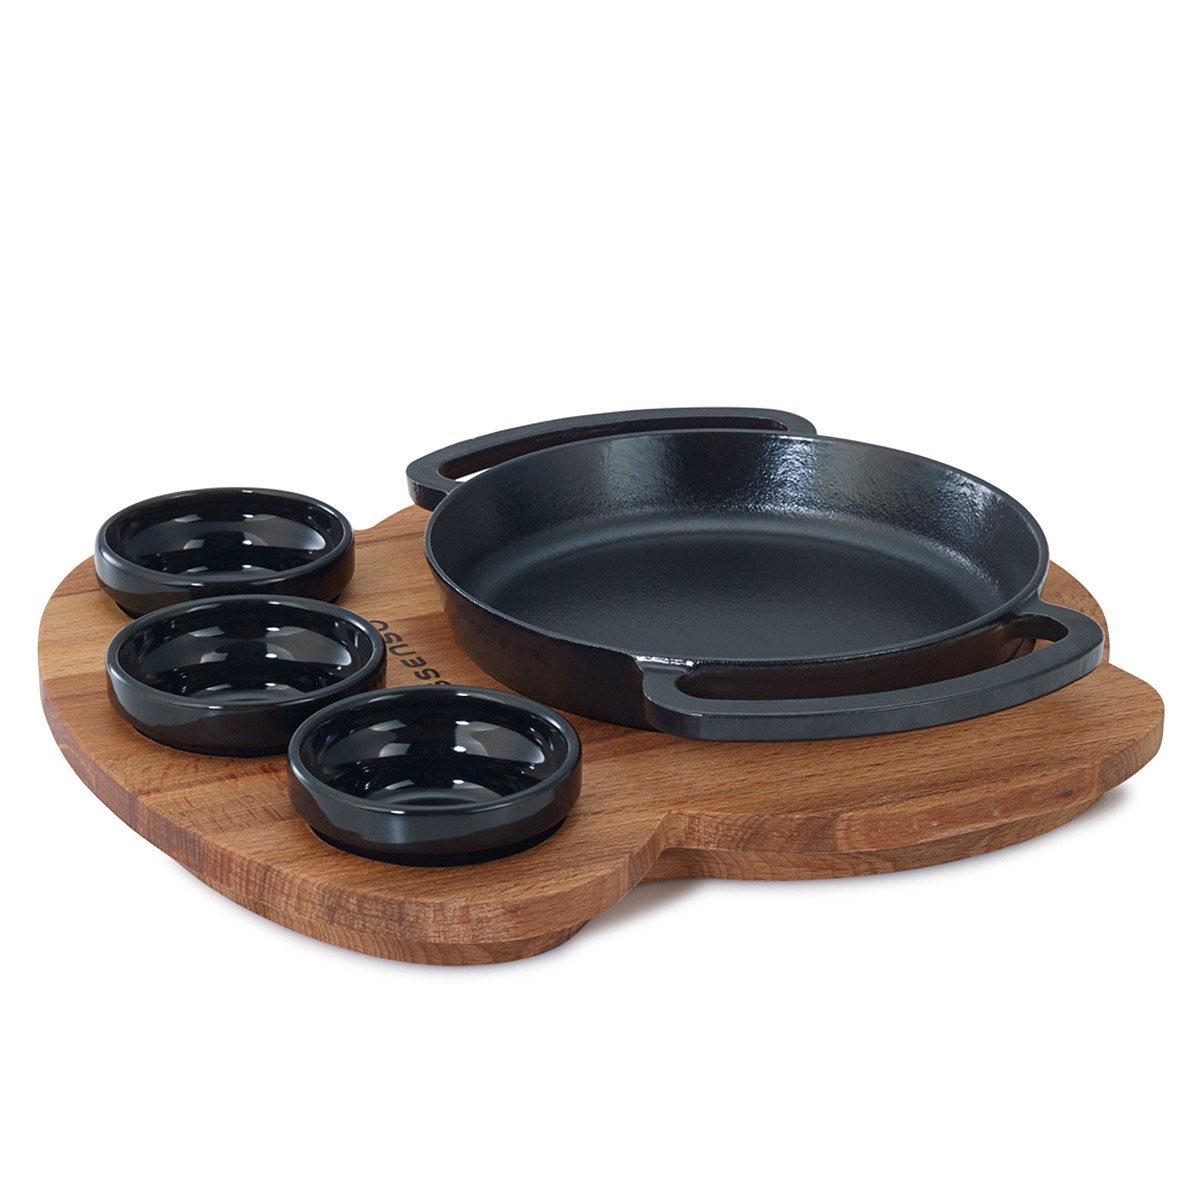 Cast iron kitchen trivet tea pot stand metal hot dish tray cookware - Cast Iron Serving Set With Wood Trivet 3 Thumbnail